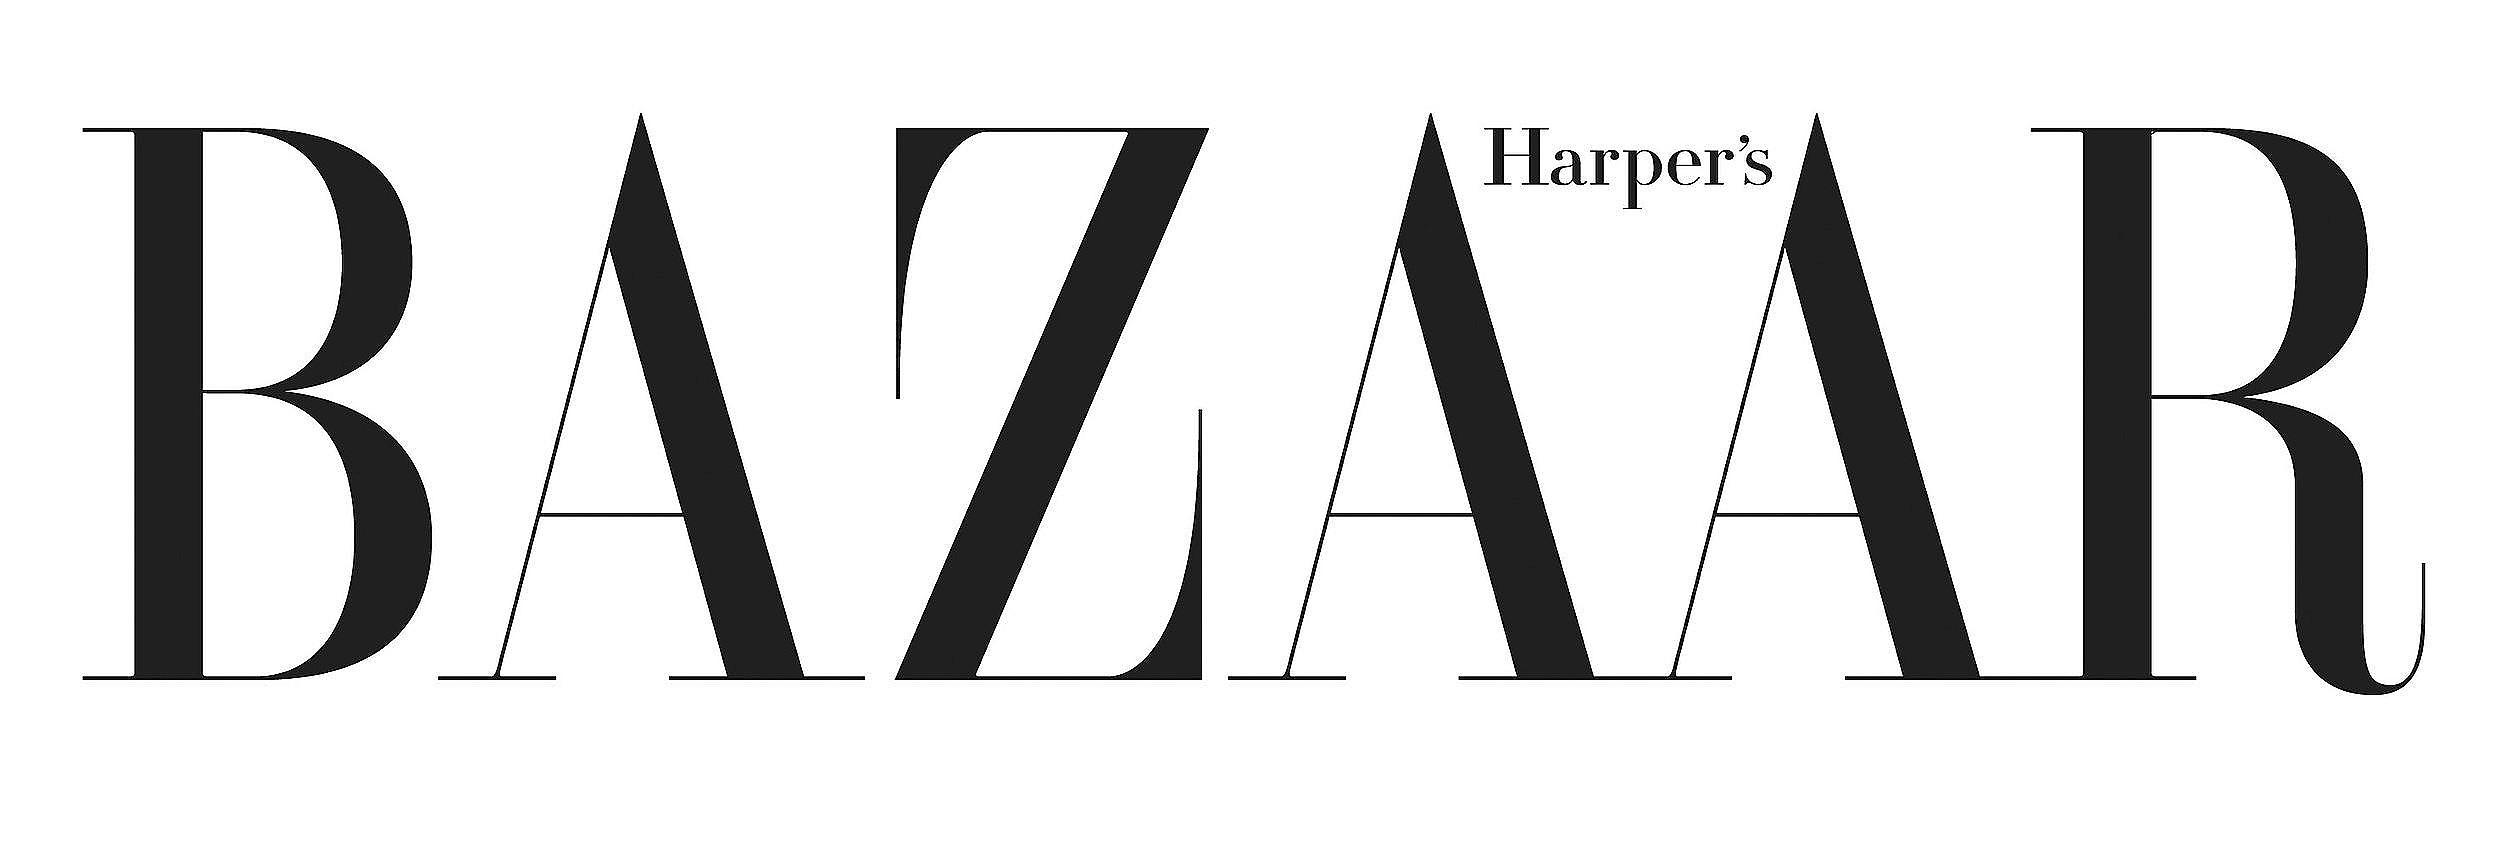 Harper%27s_Bazaar_Logo.jpg